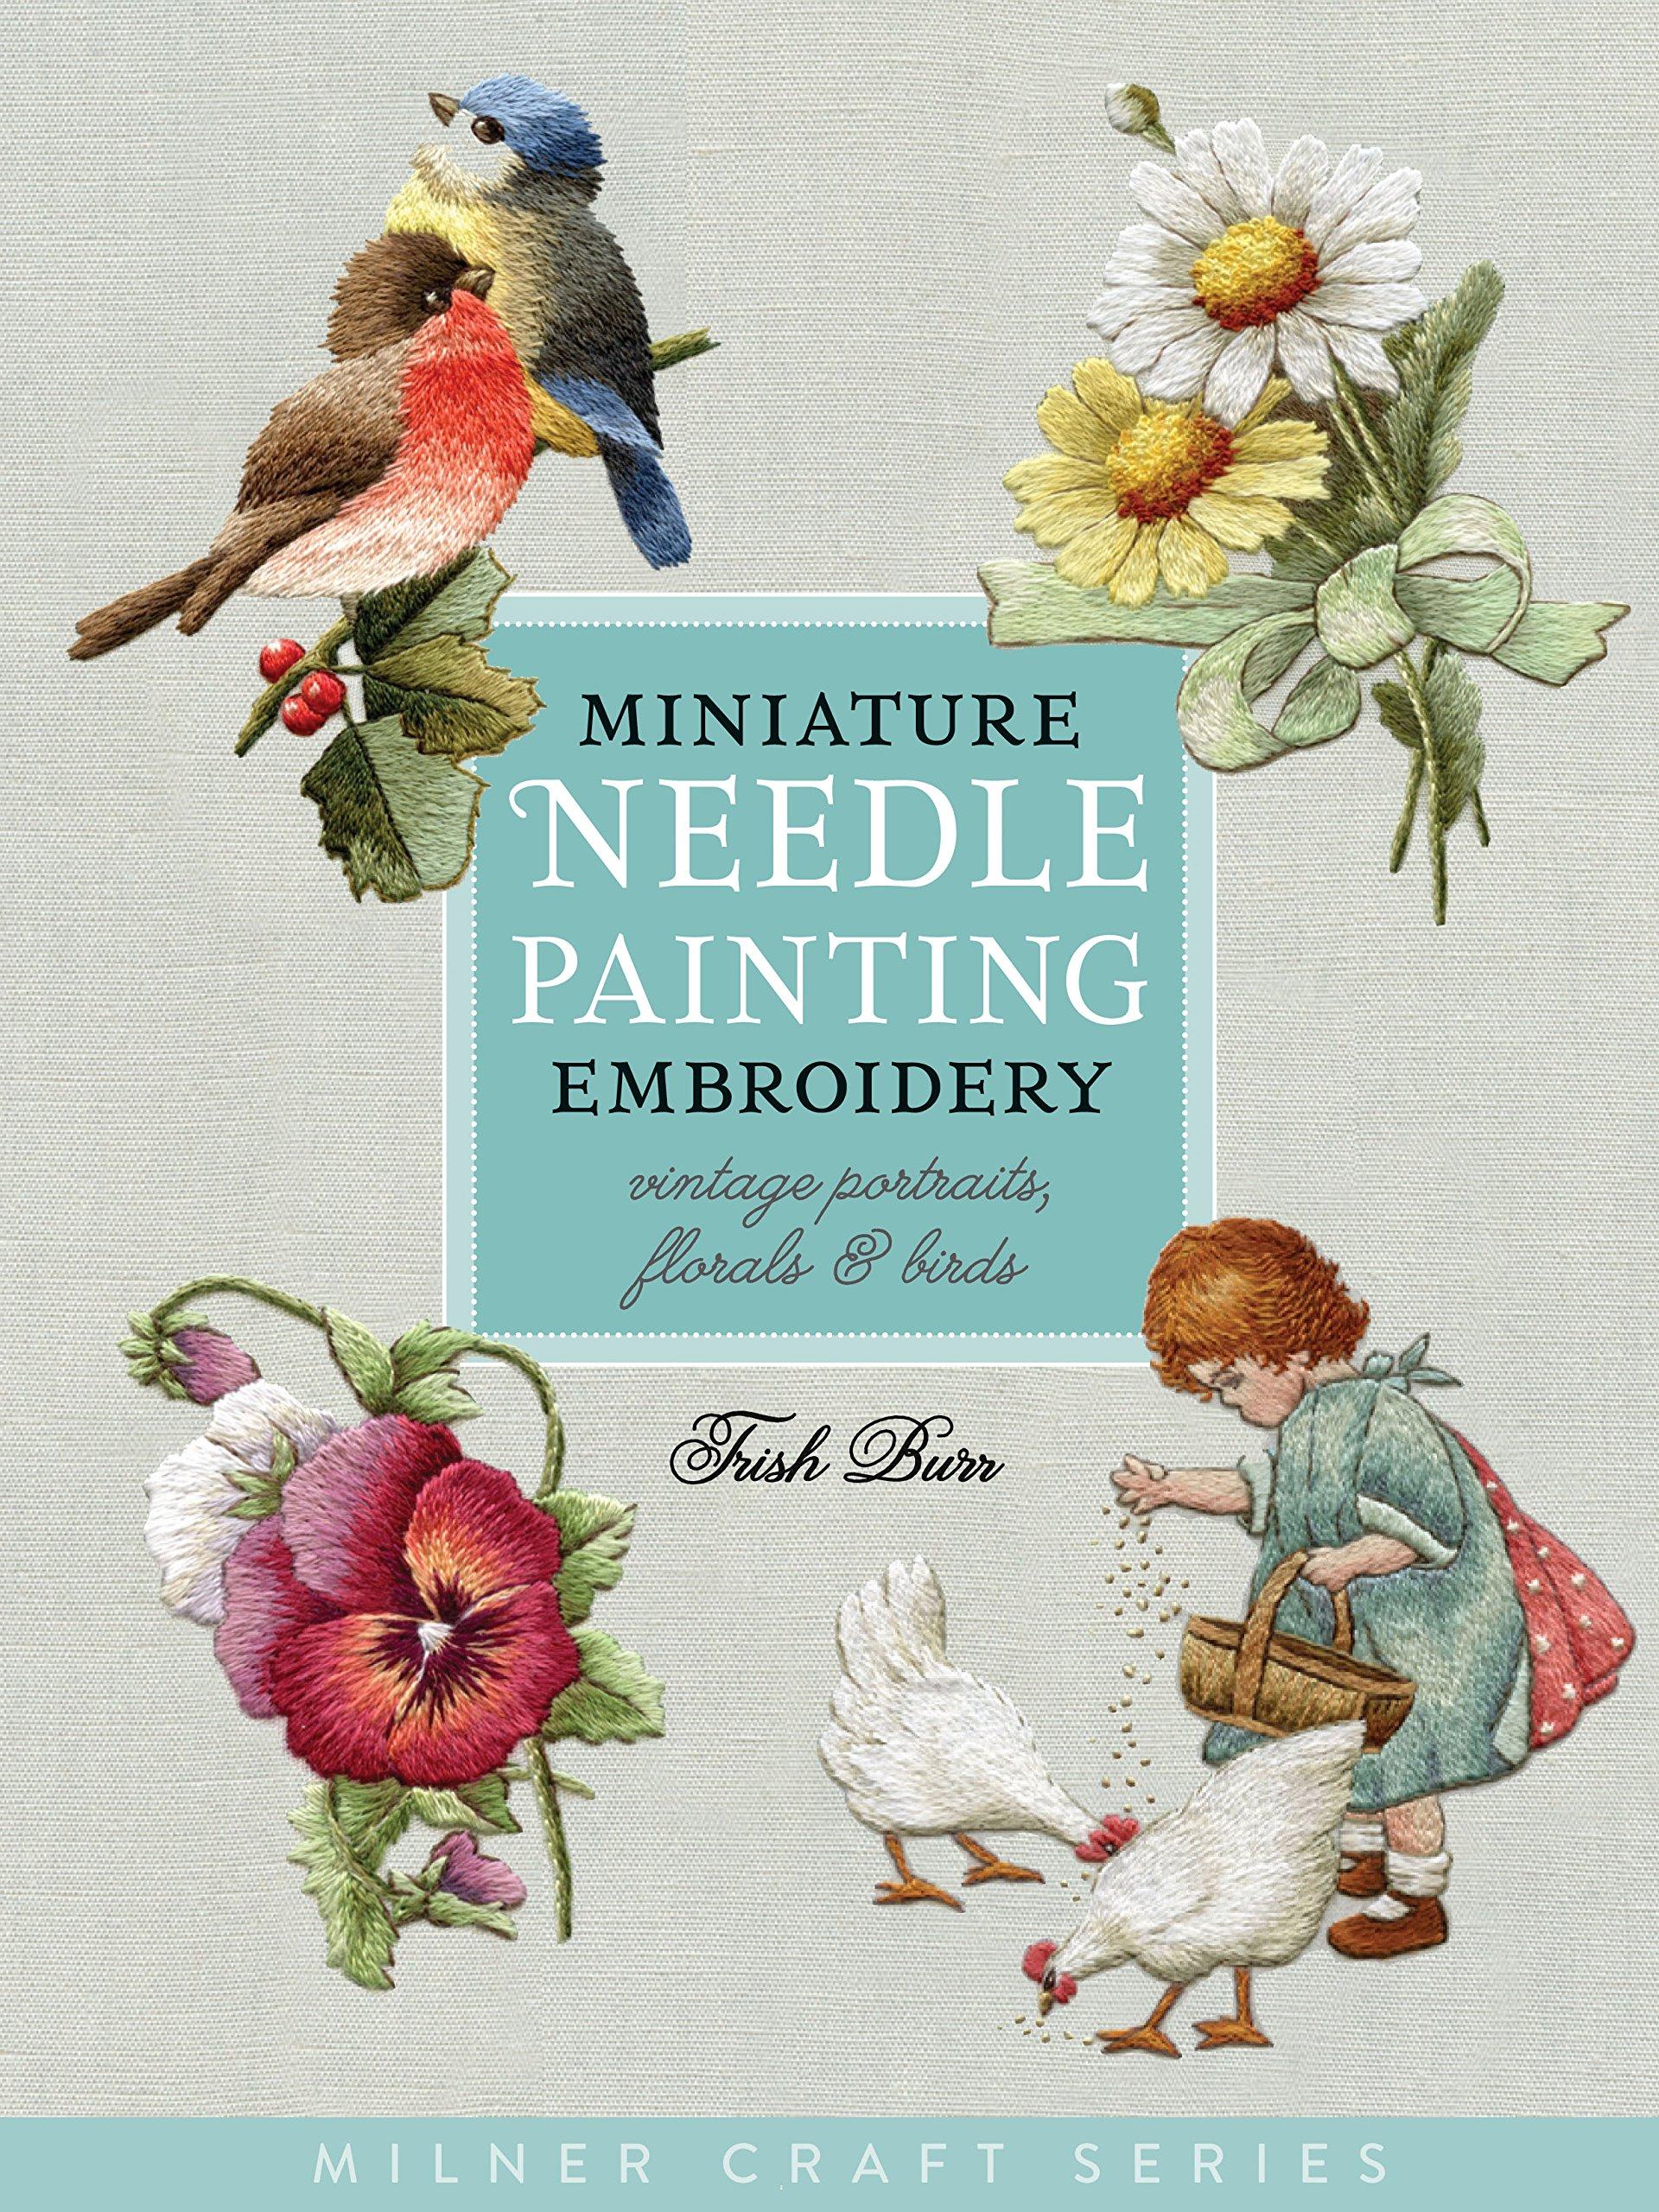 Miniature Needle Painting Embroidery Vintage Portraits Florals Birds Milner Craft Series Burr Trish 9781863514705 Amazon Com Books